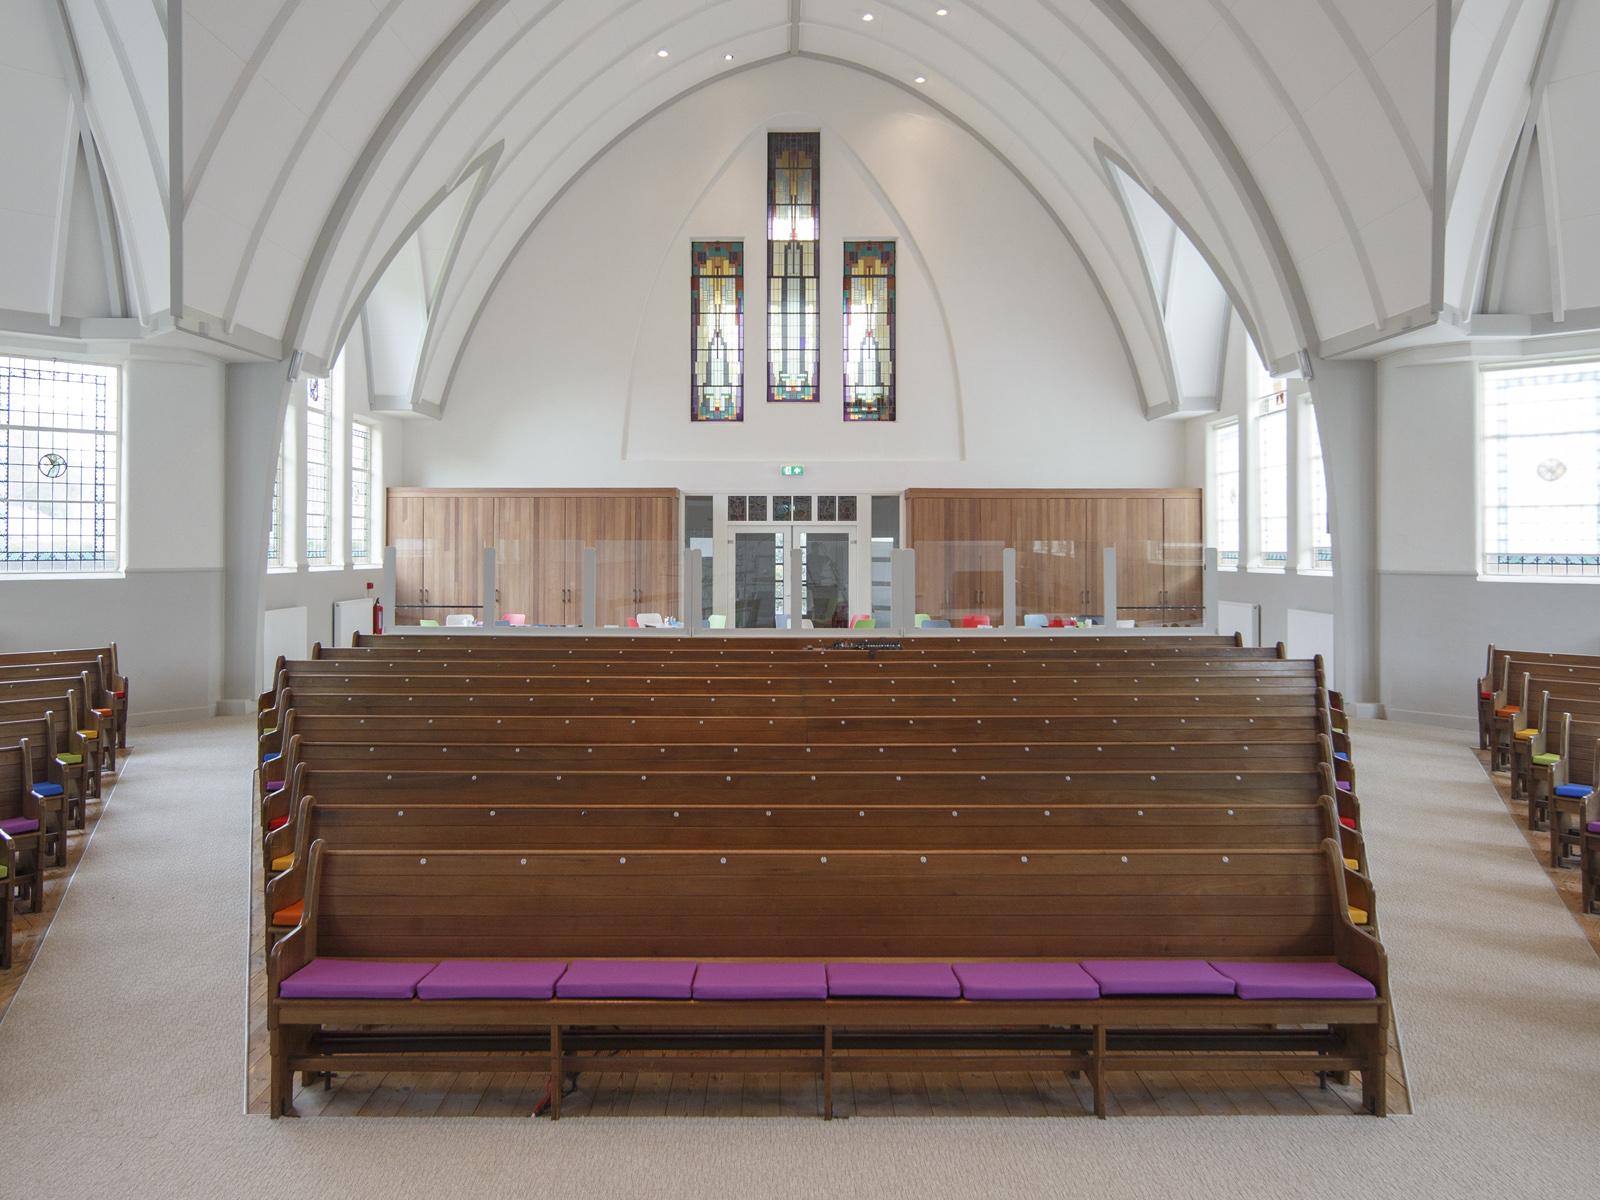 church-02-the-way-we-build 1600